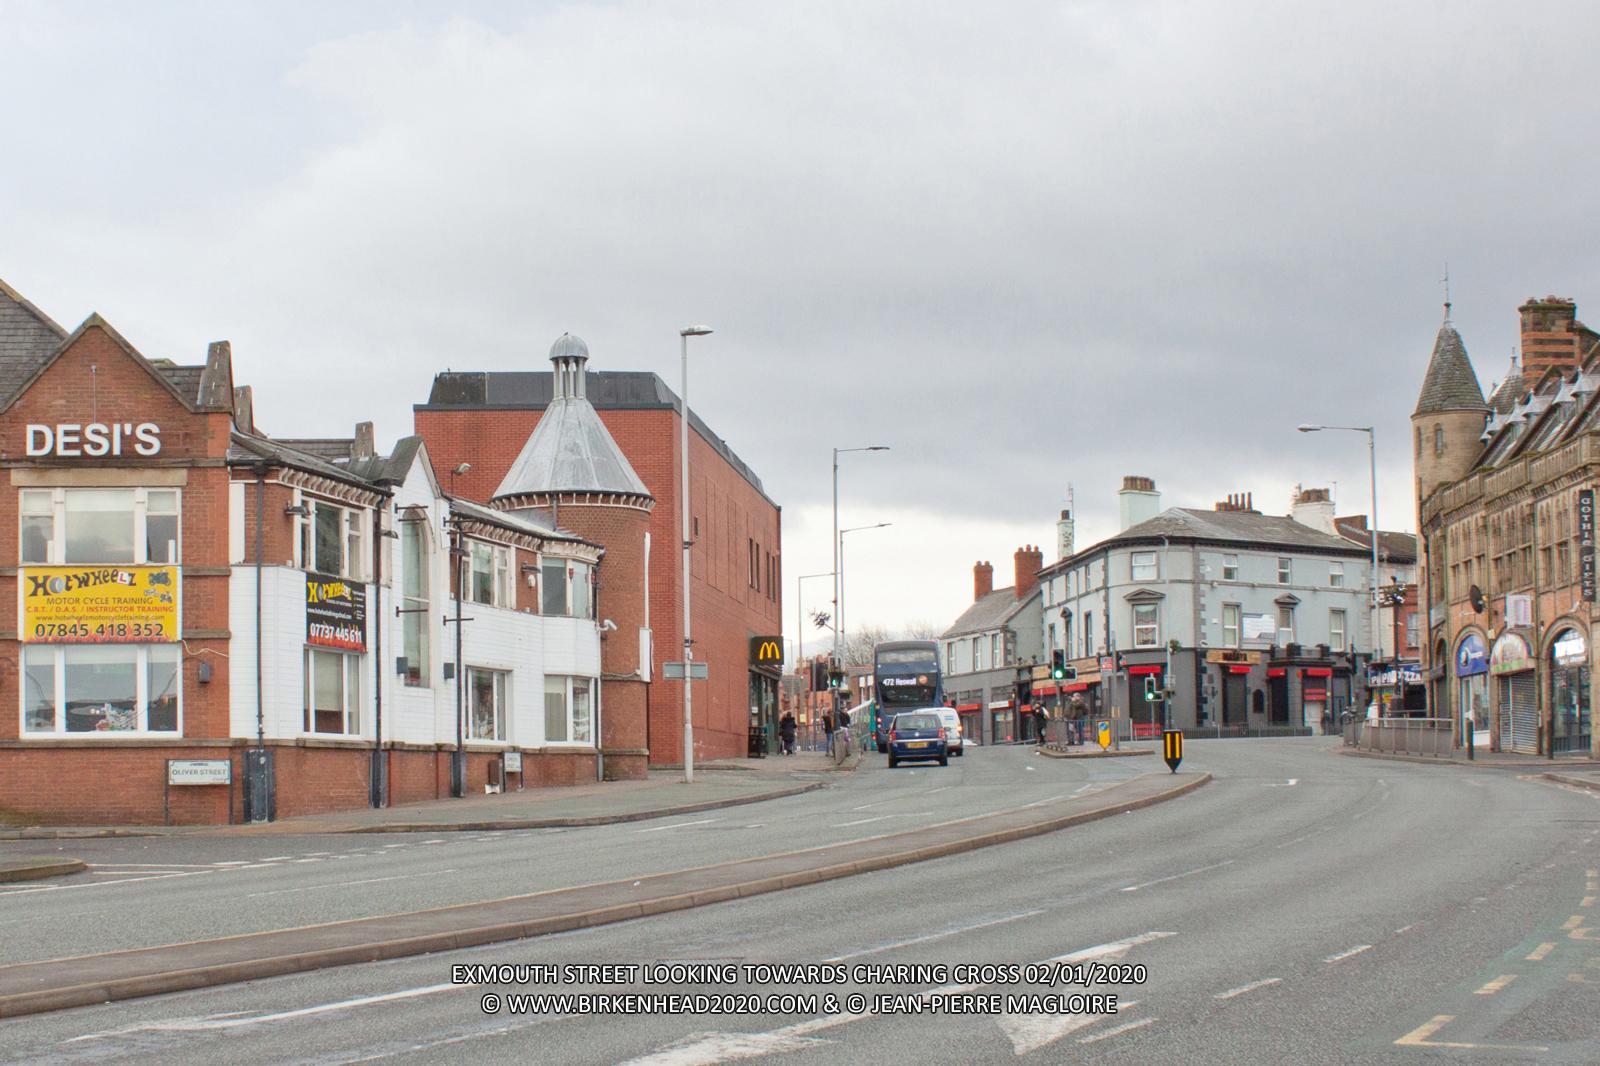 Exmouth Street_Desis